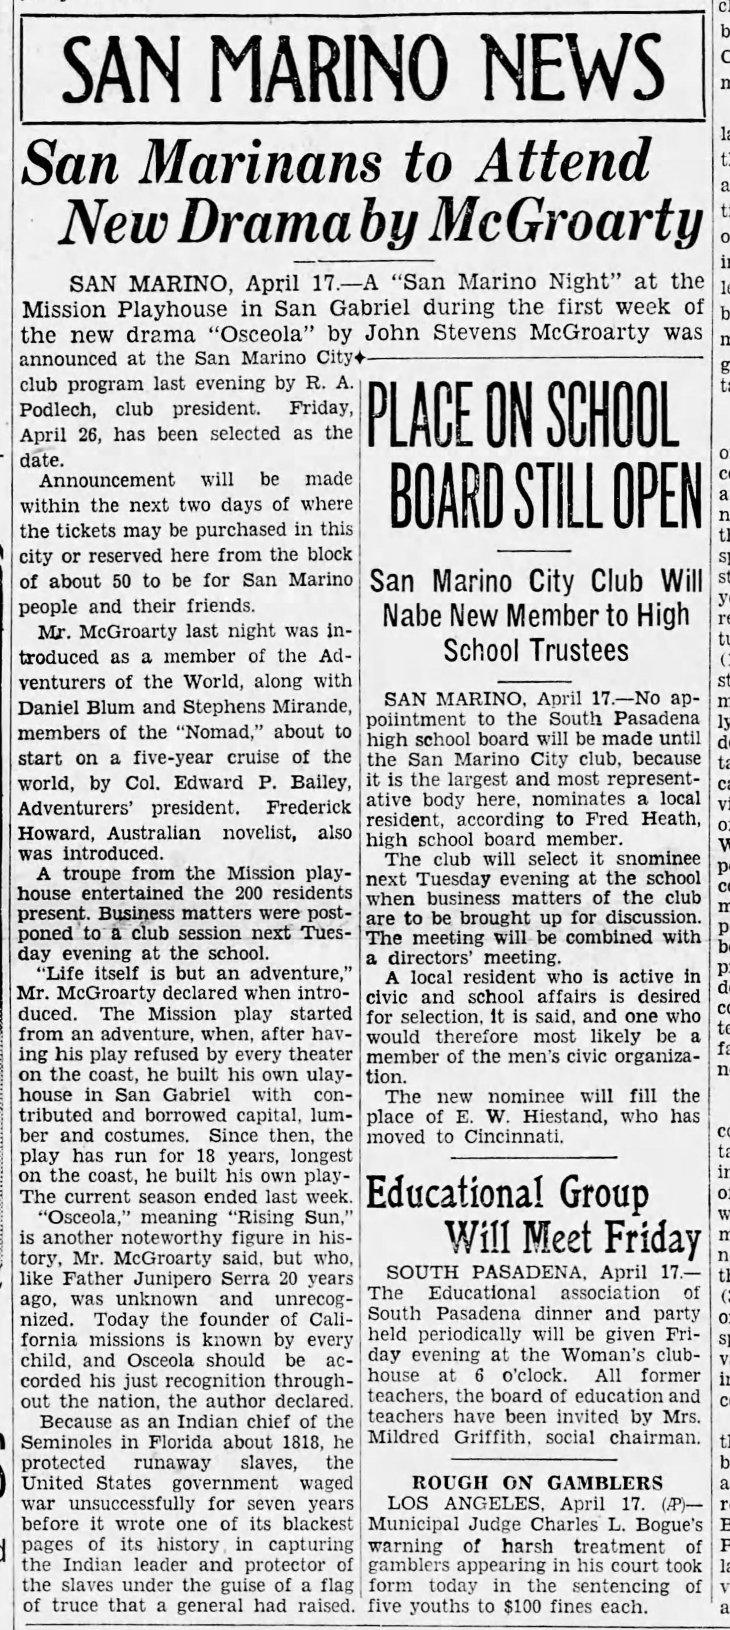 The_Pasadena_Post_Wed__Apr_17__1929_